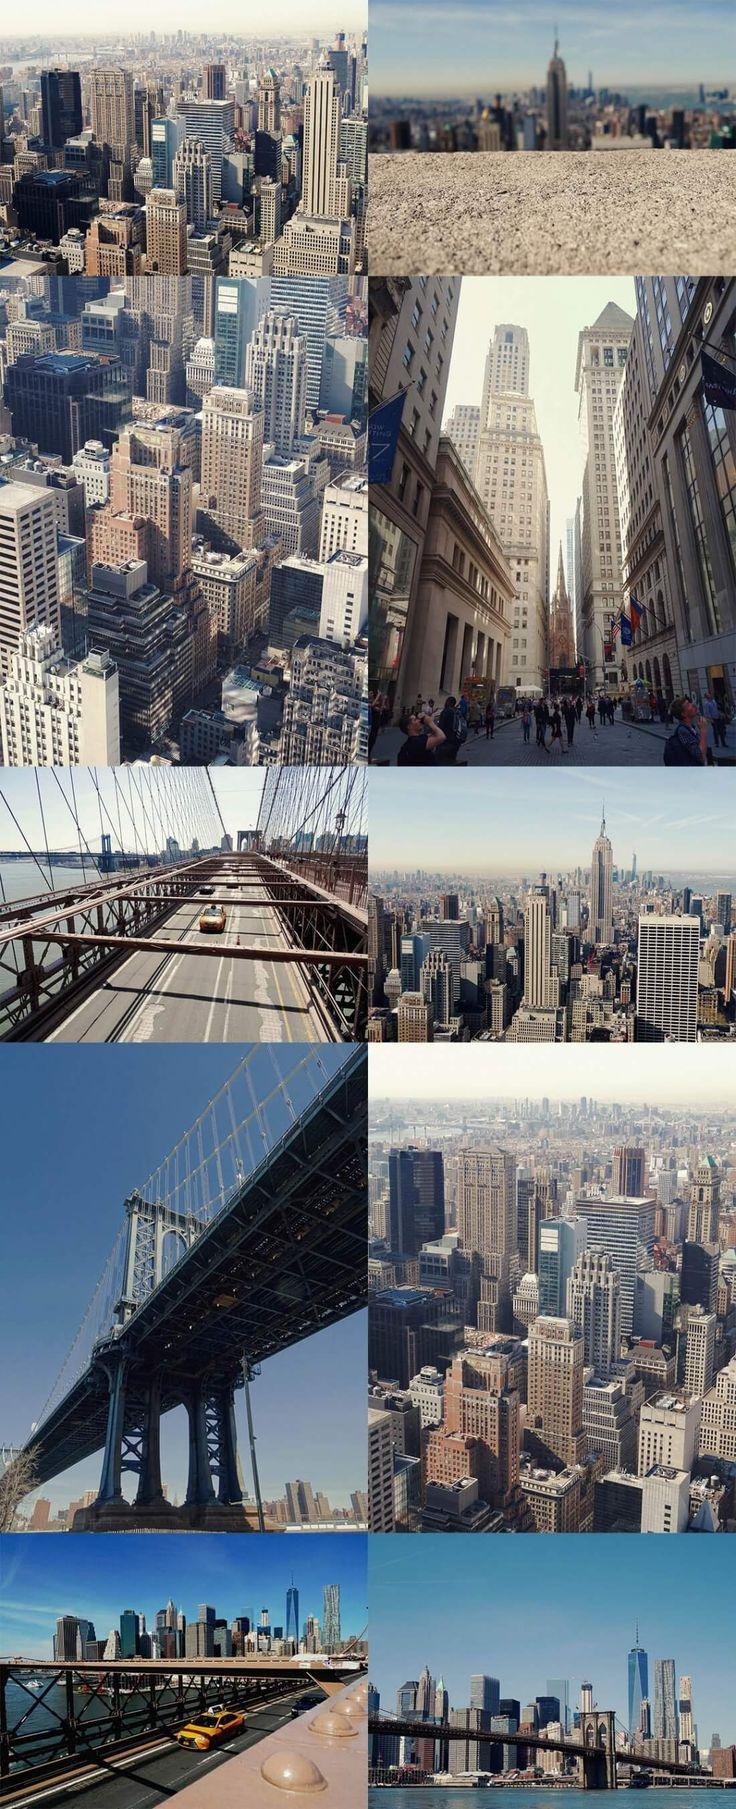 New York -  Graphic Arts